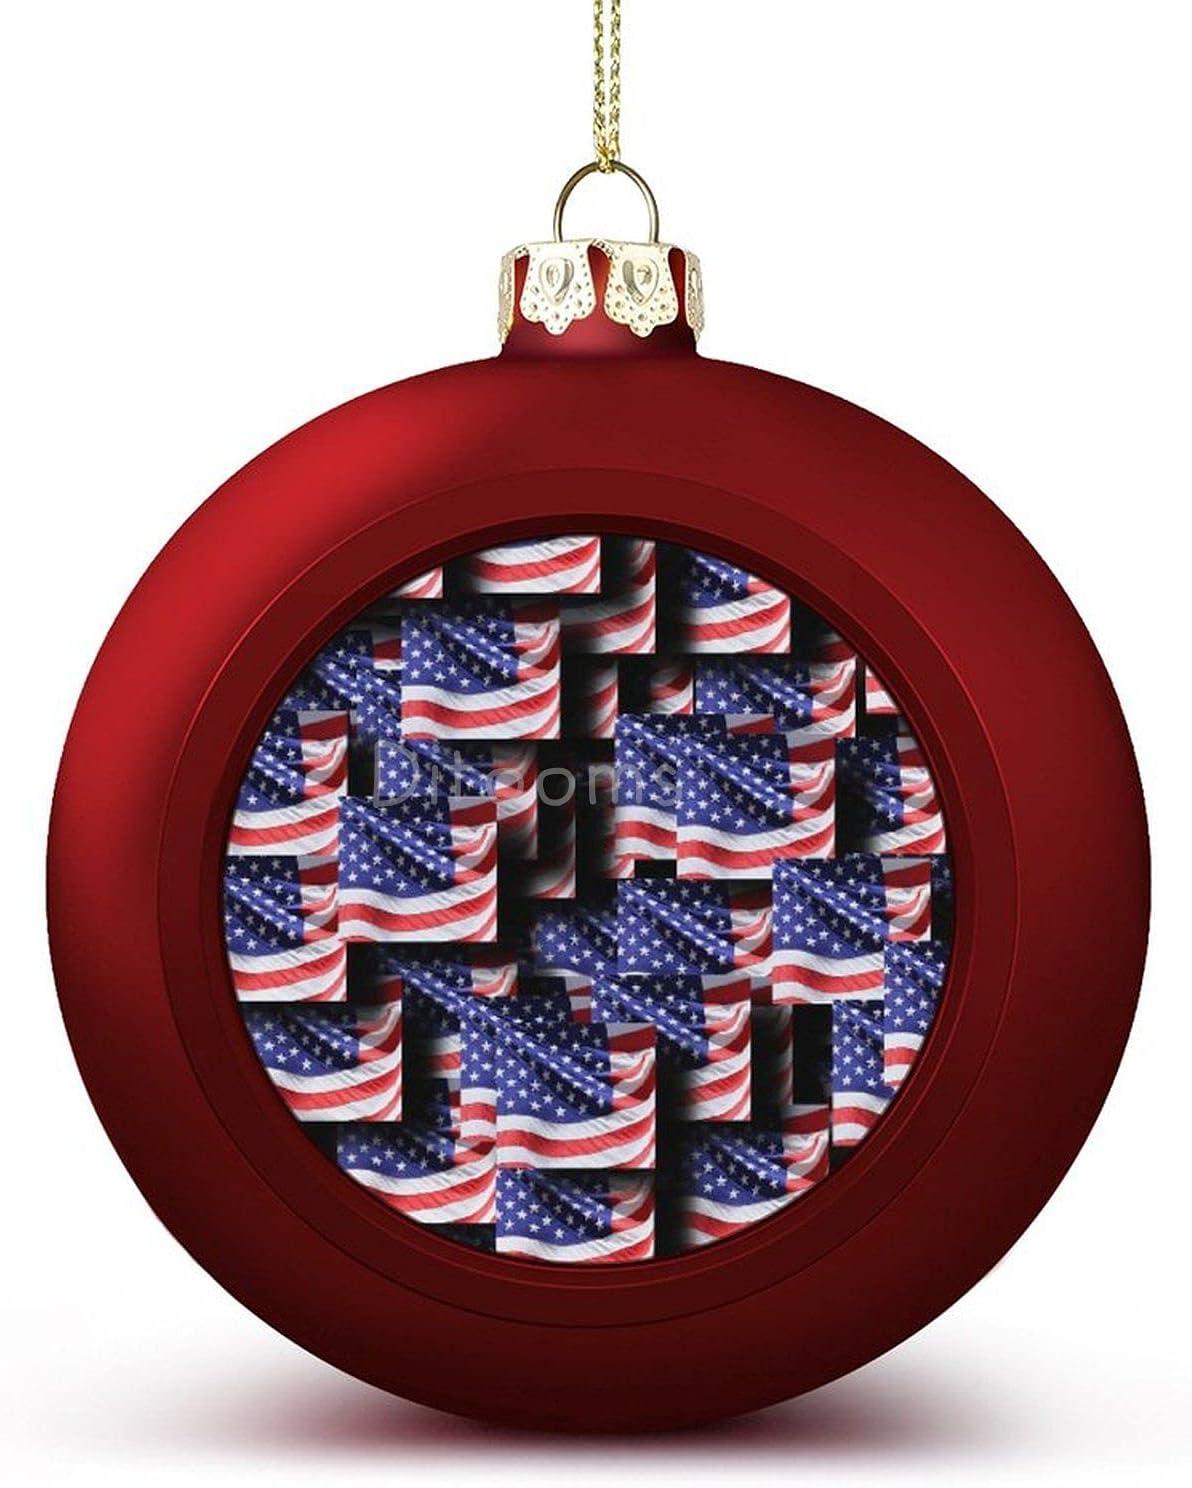 4PCS Christmas Balls OFFicial Ornaments Flag American Ch America Super-cheap USA